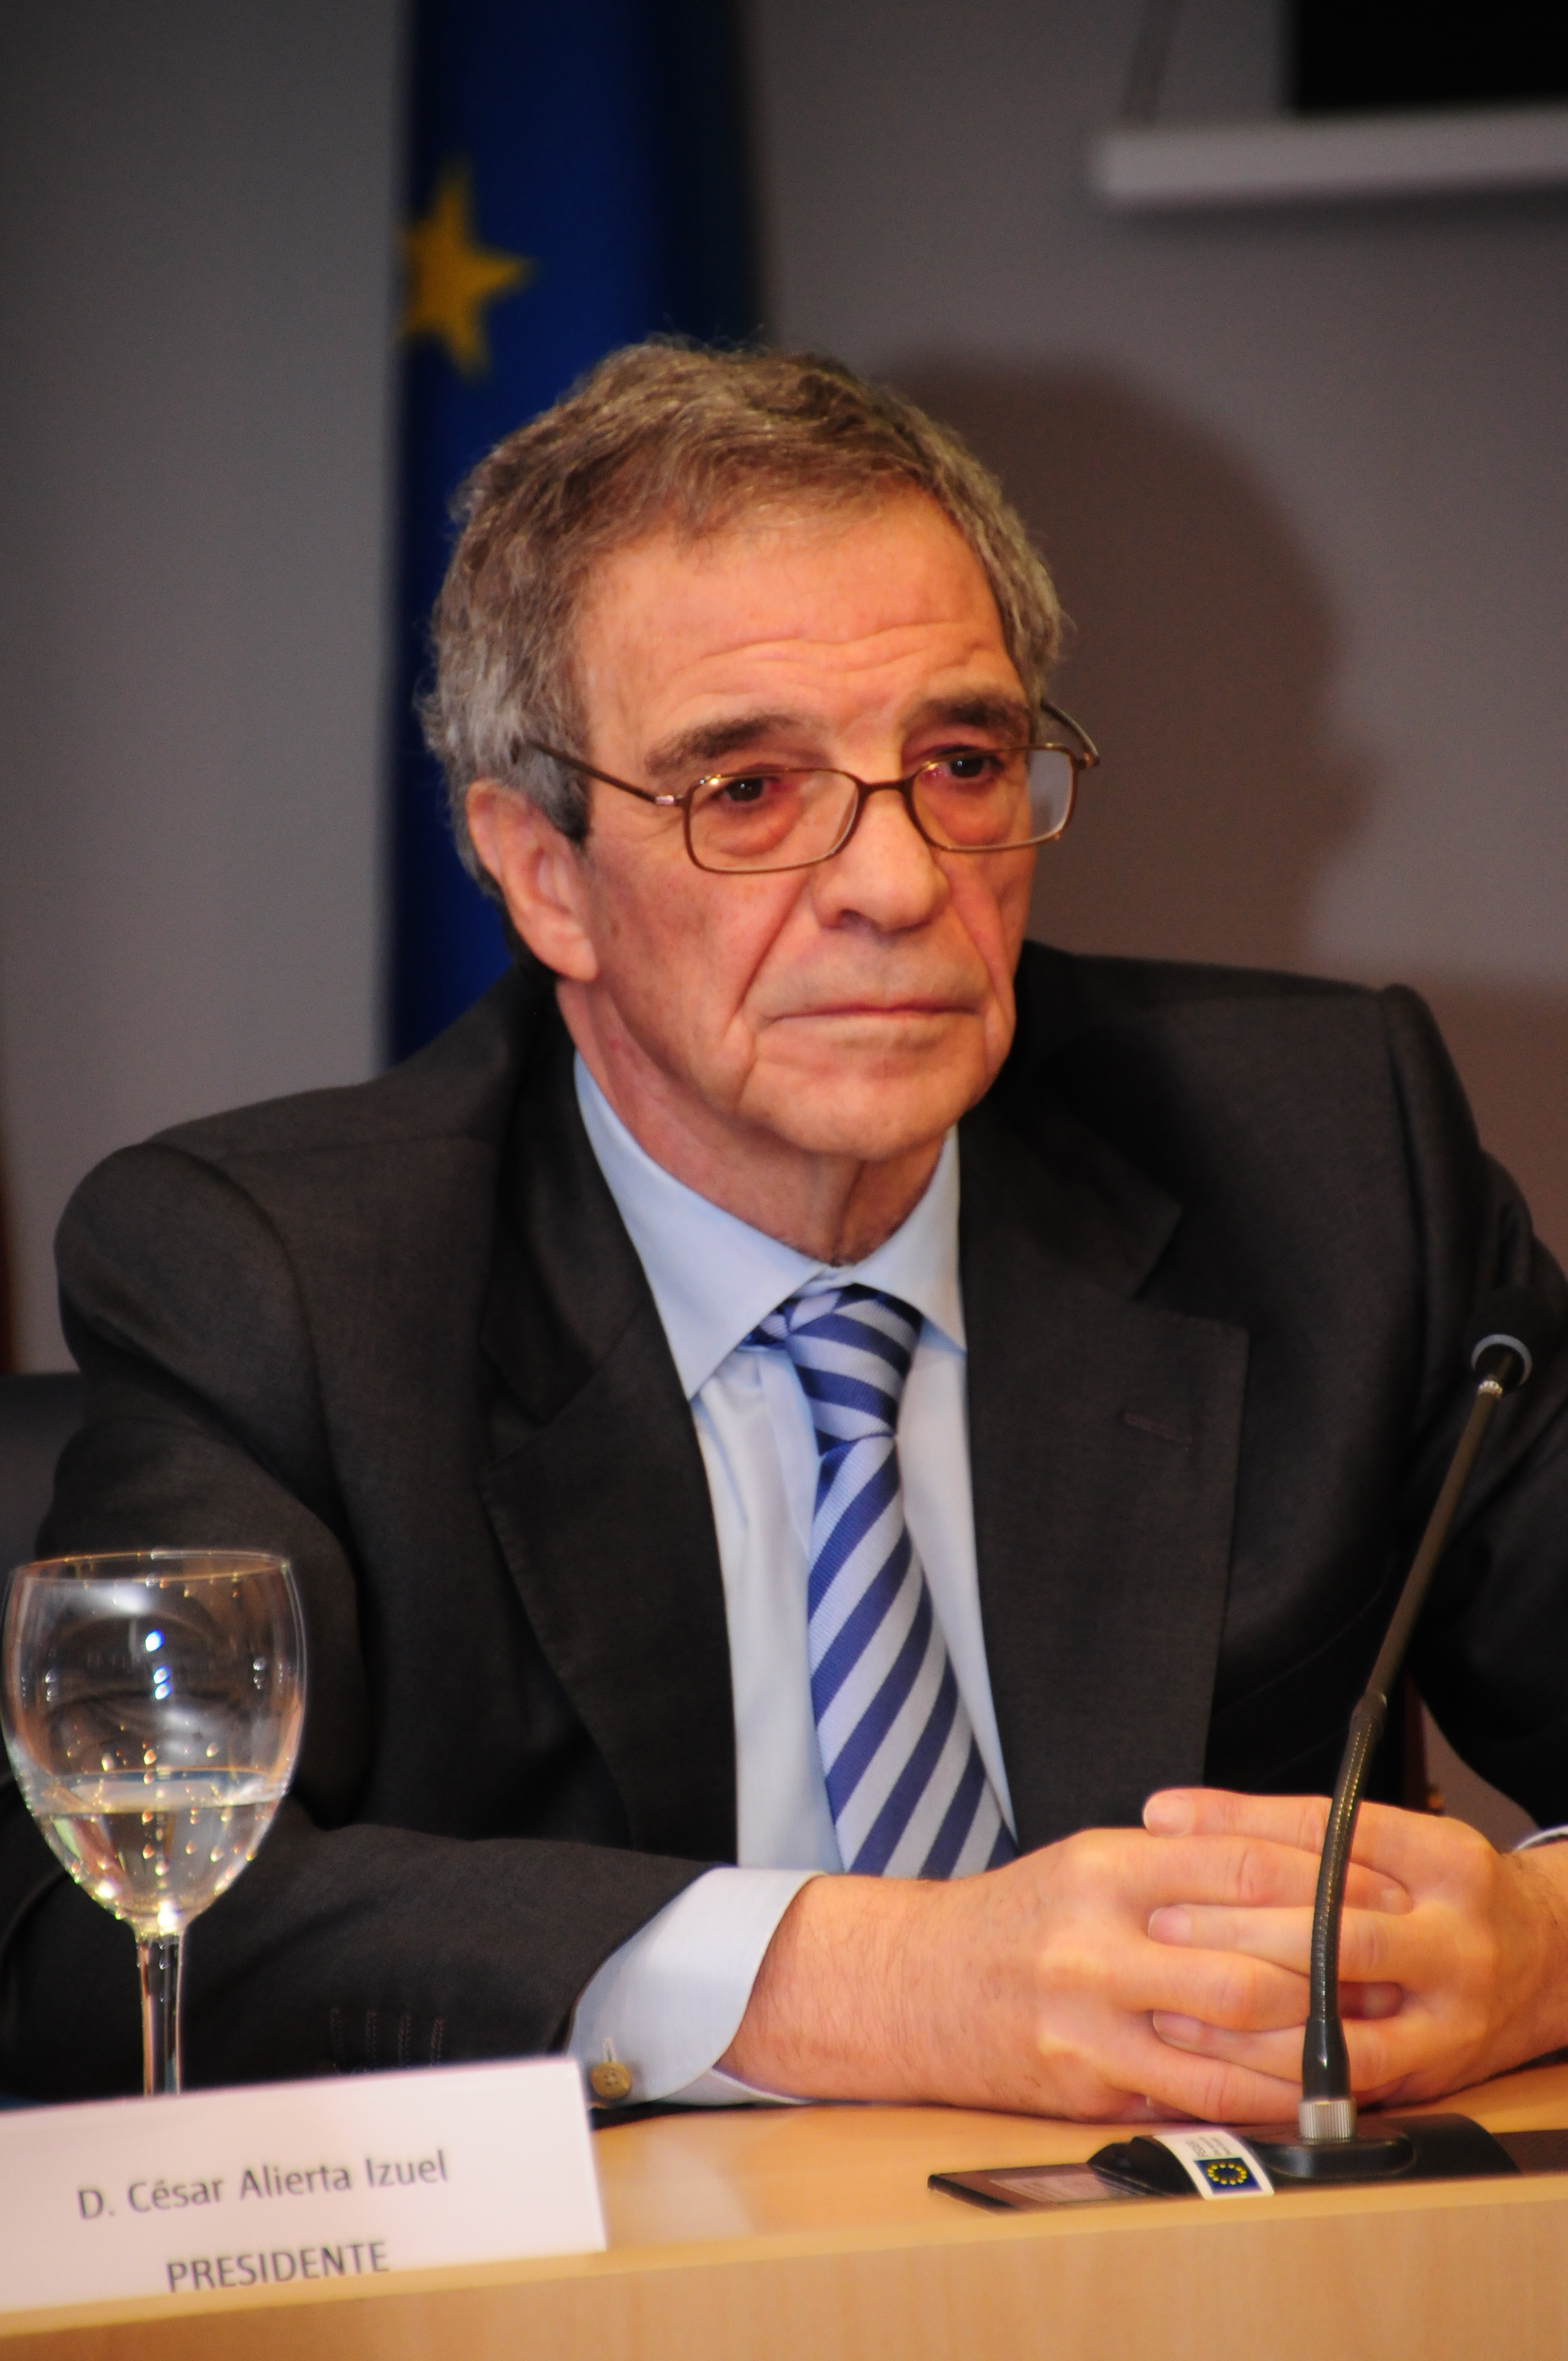 Telefónica: the well-connected EU and Spanish lobbyist